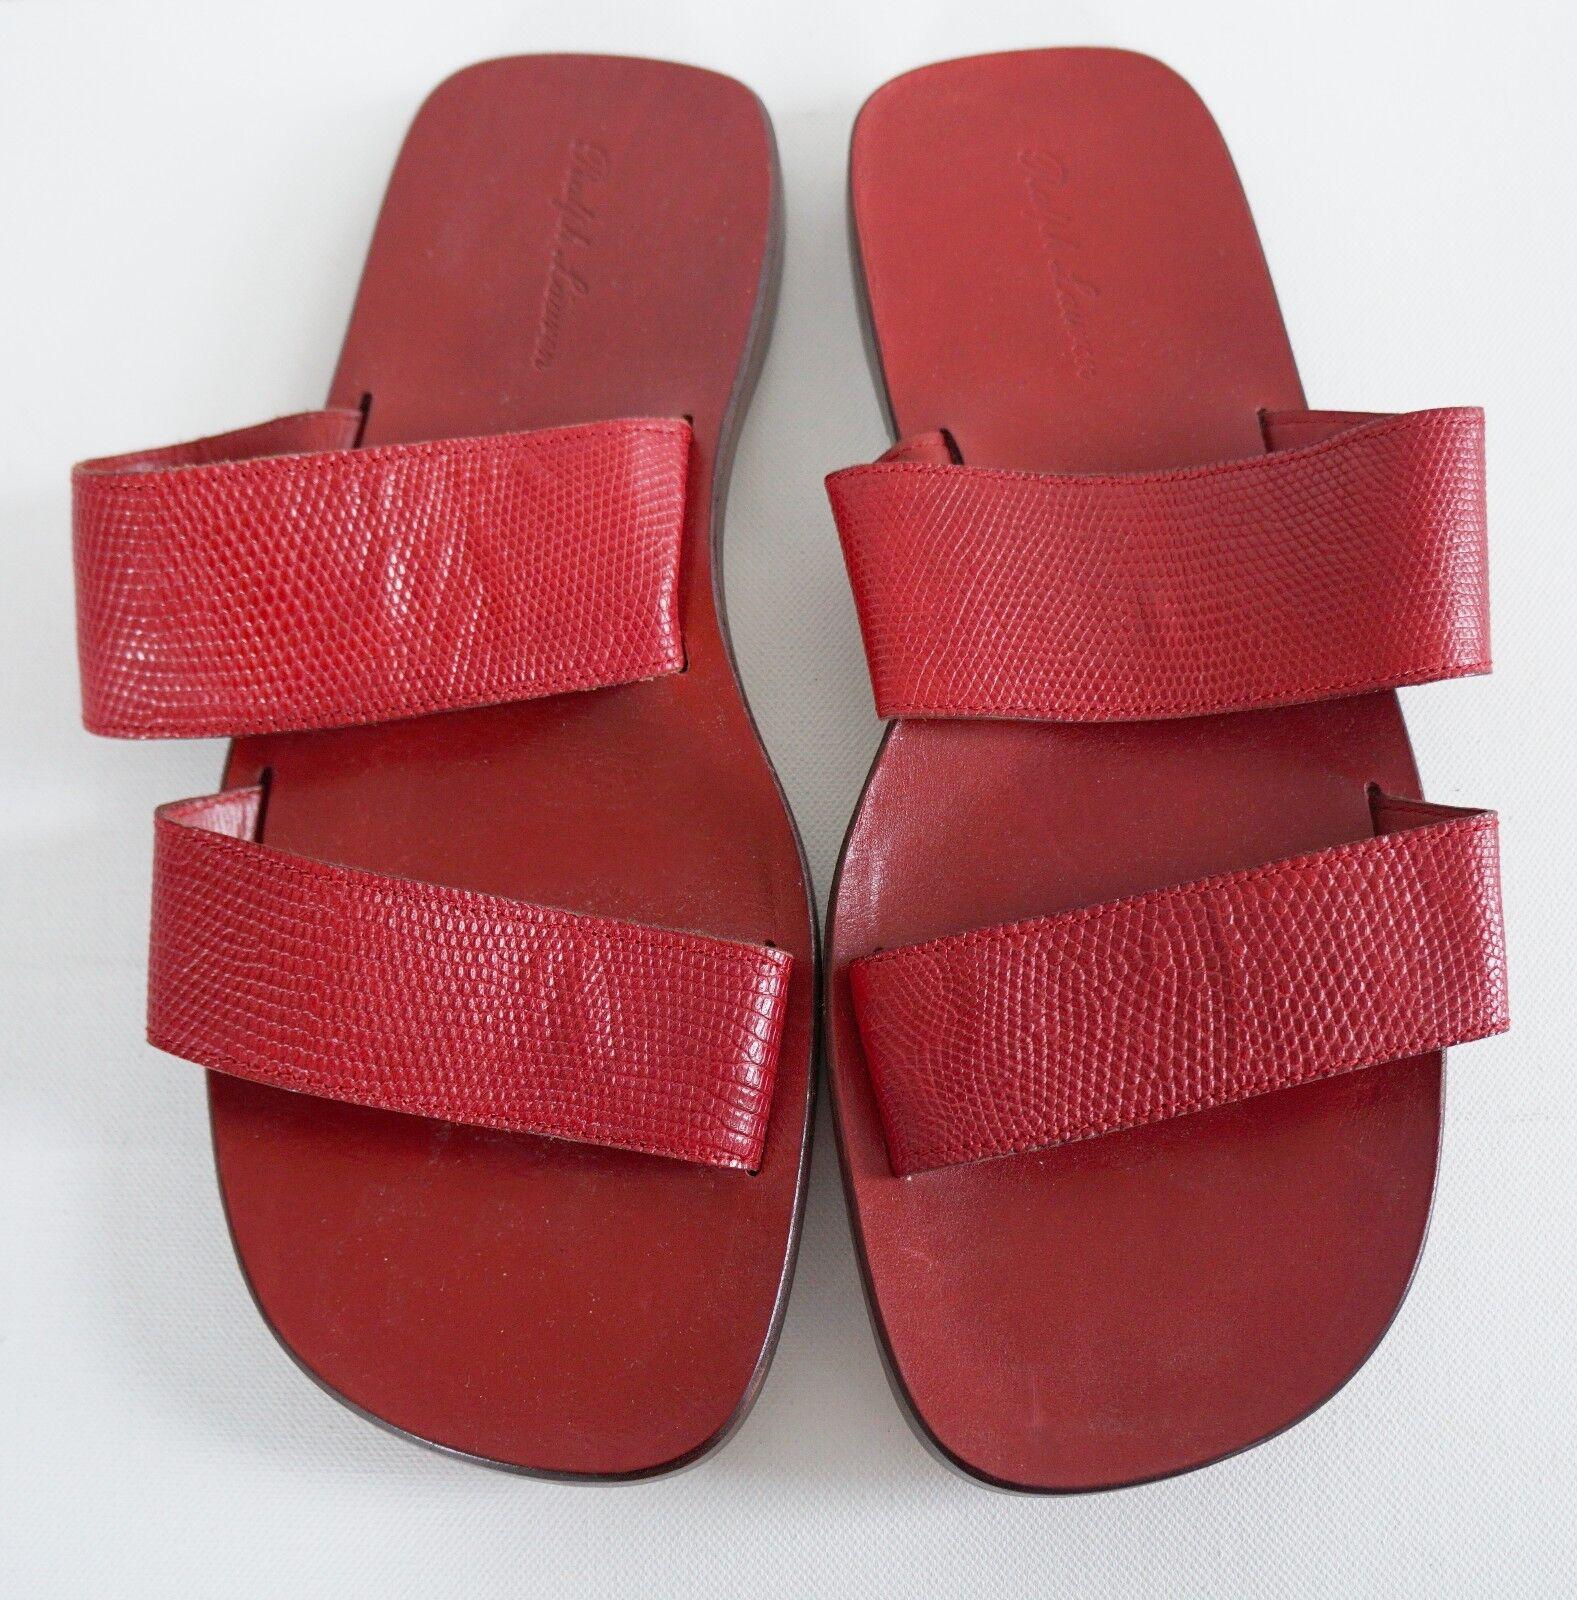 RALPH LAUREN Red Genuine LIZARD Strap Sandals Slides Shoes  -10.5D